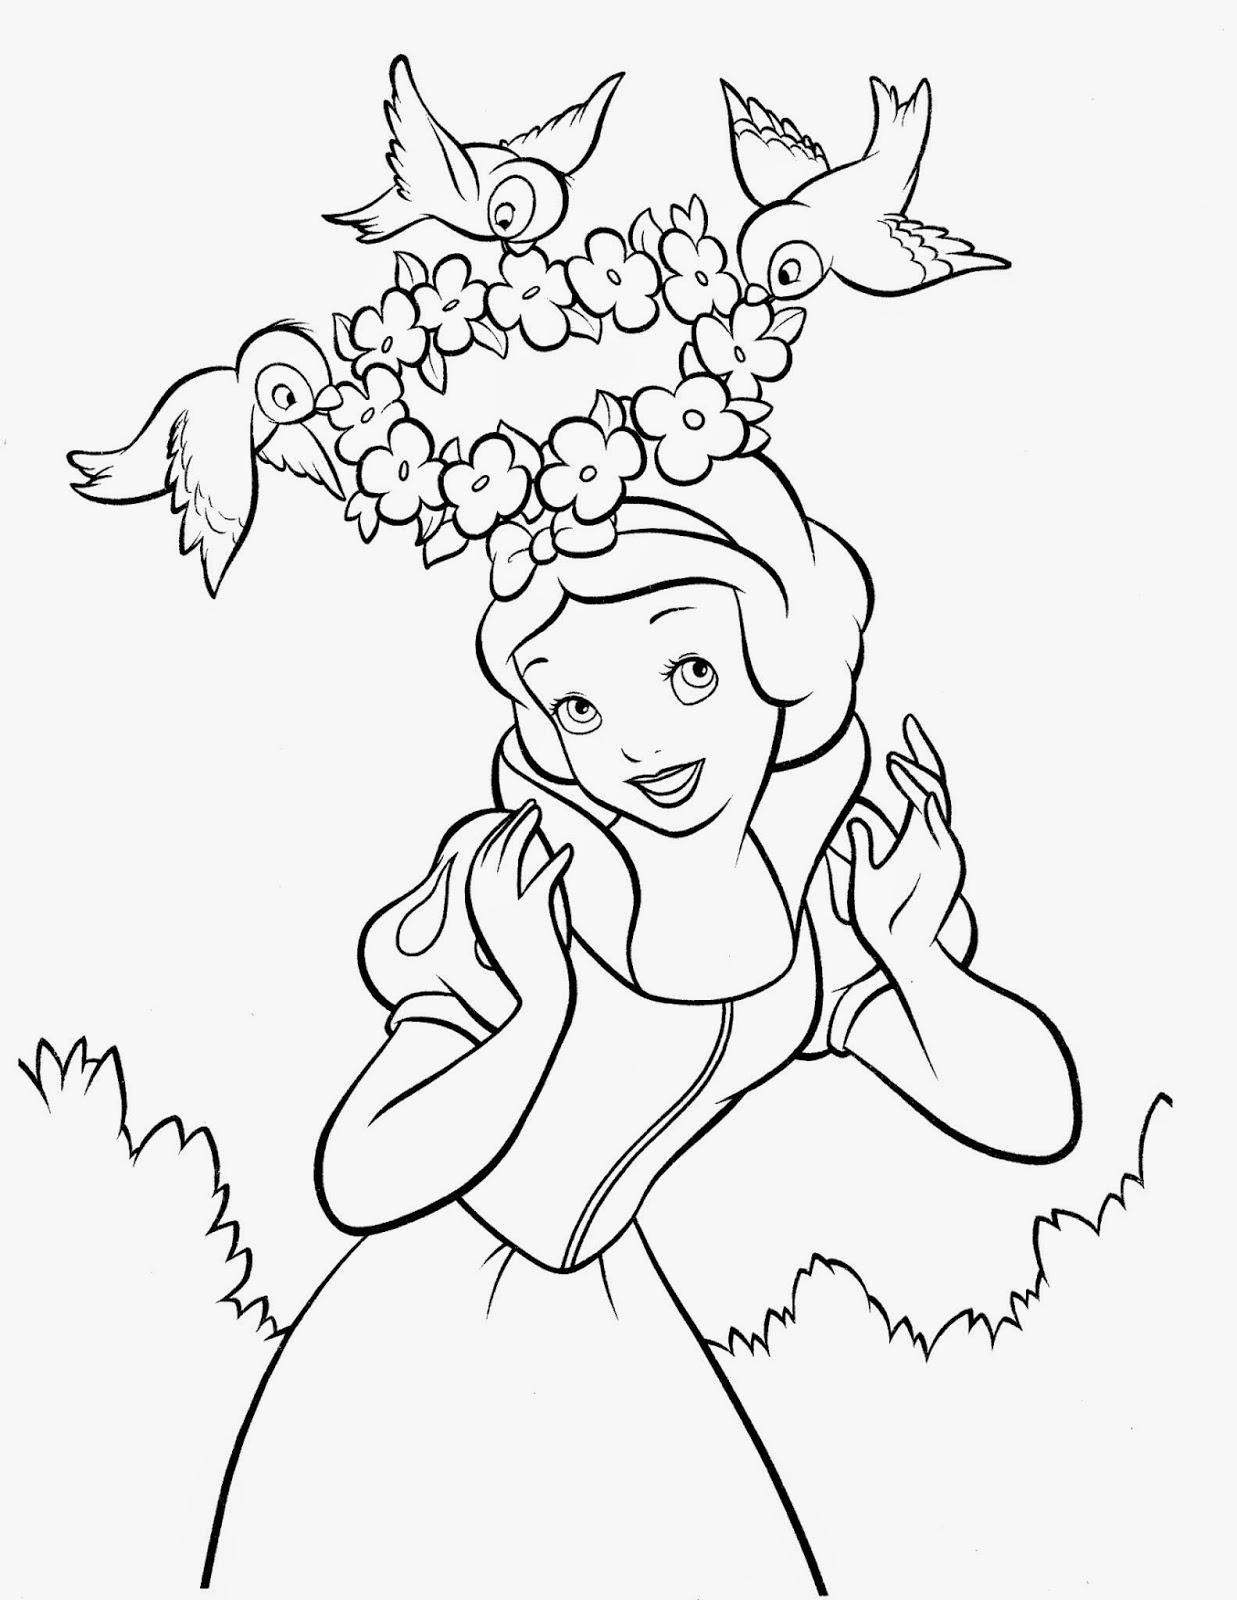 snow coloring page free printable snowflake coloring pages for kids page coloring snow